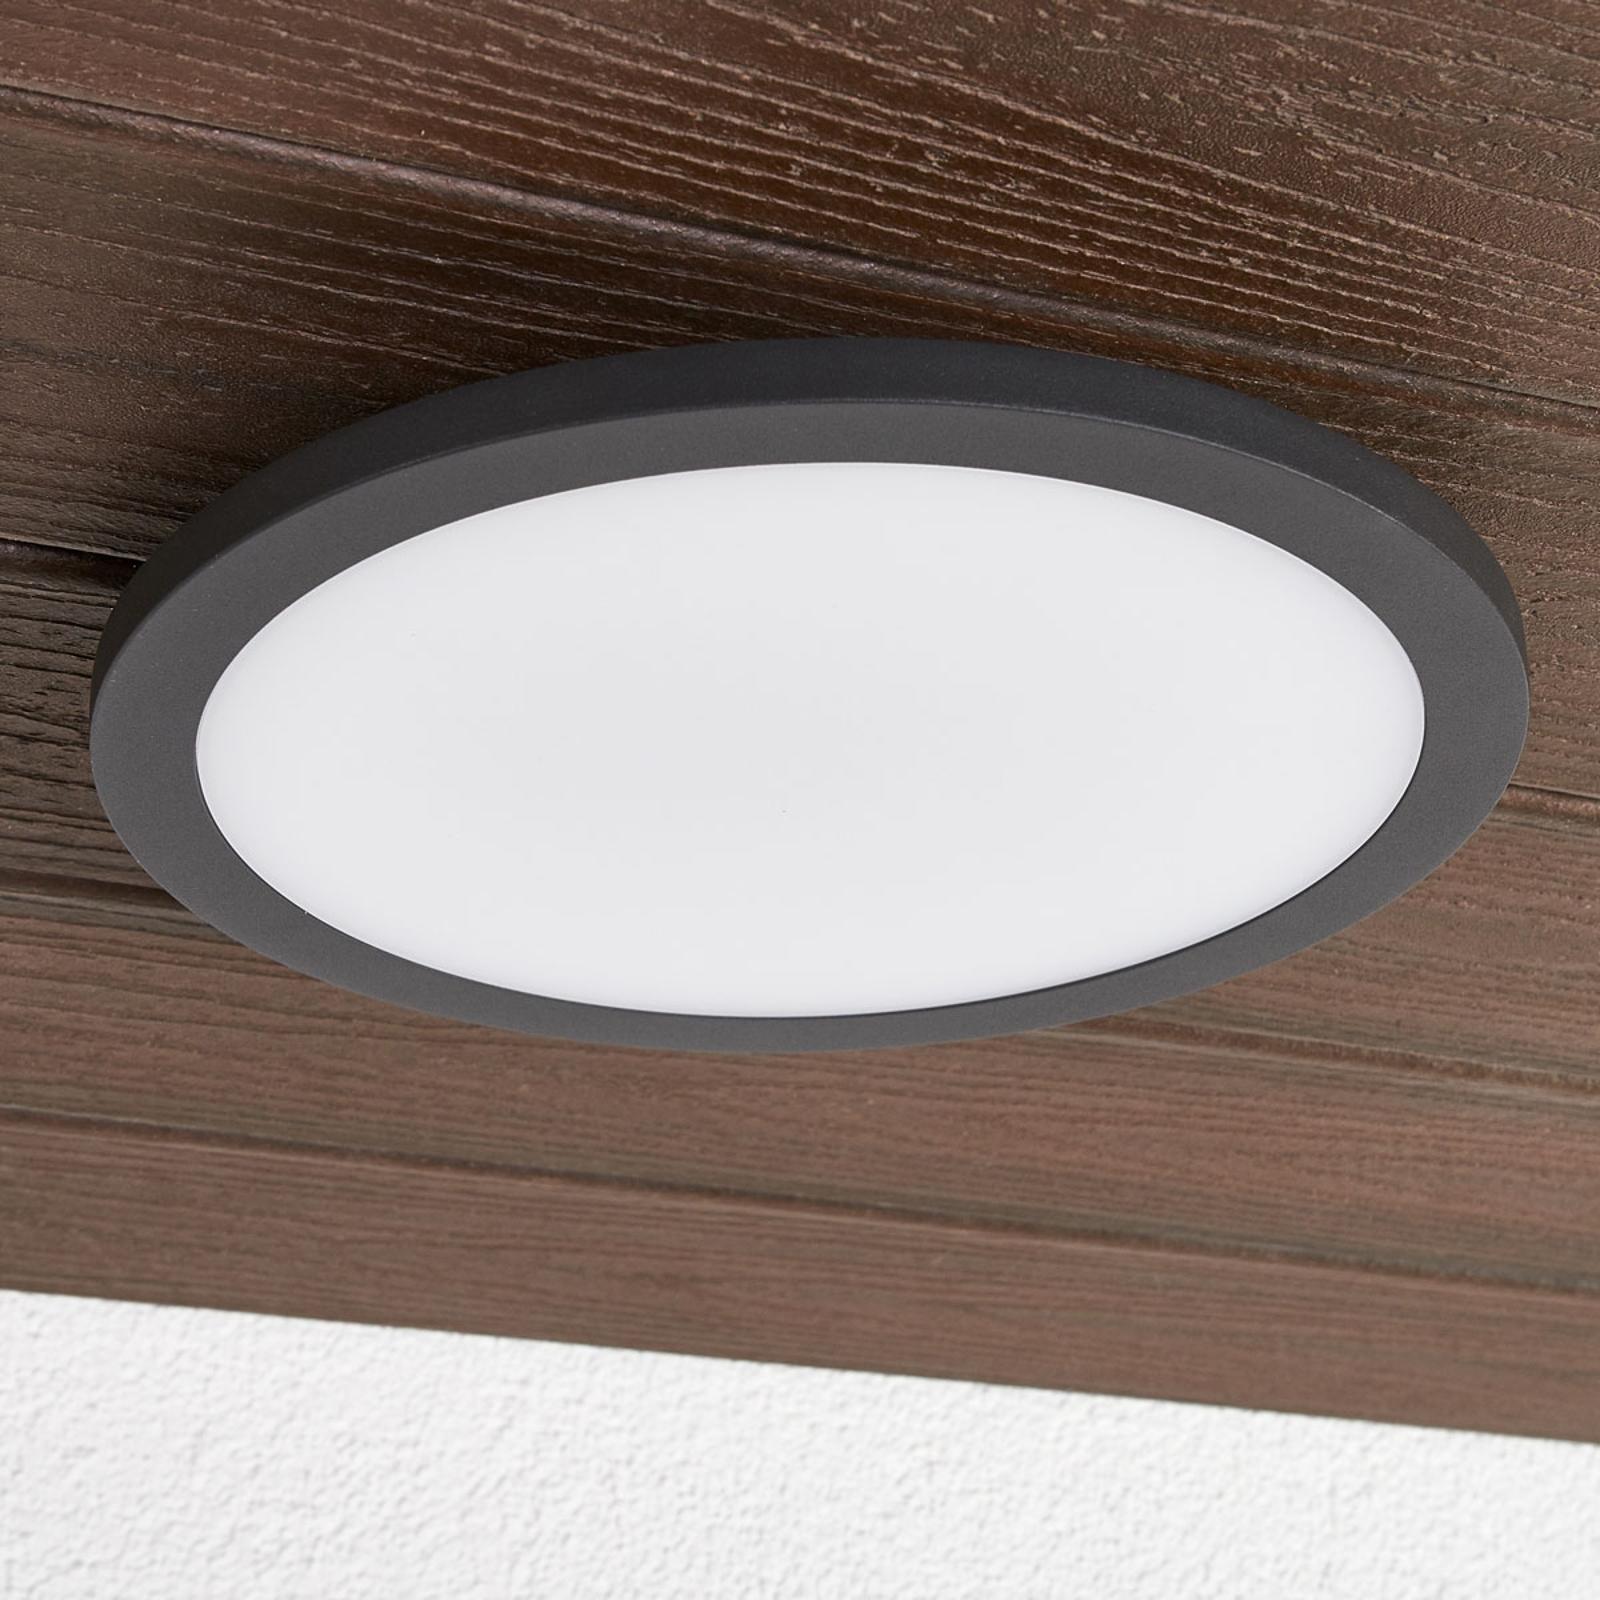 Malena-LED-ulkokattovalaisin tunnistimella